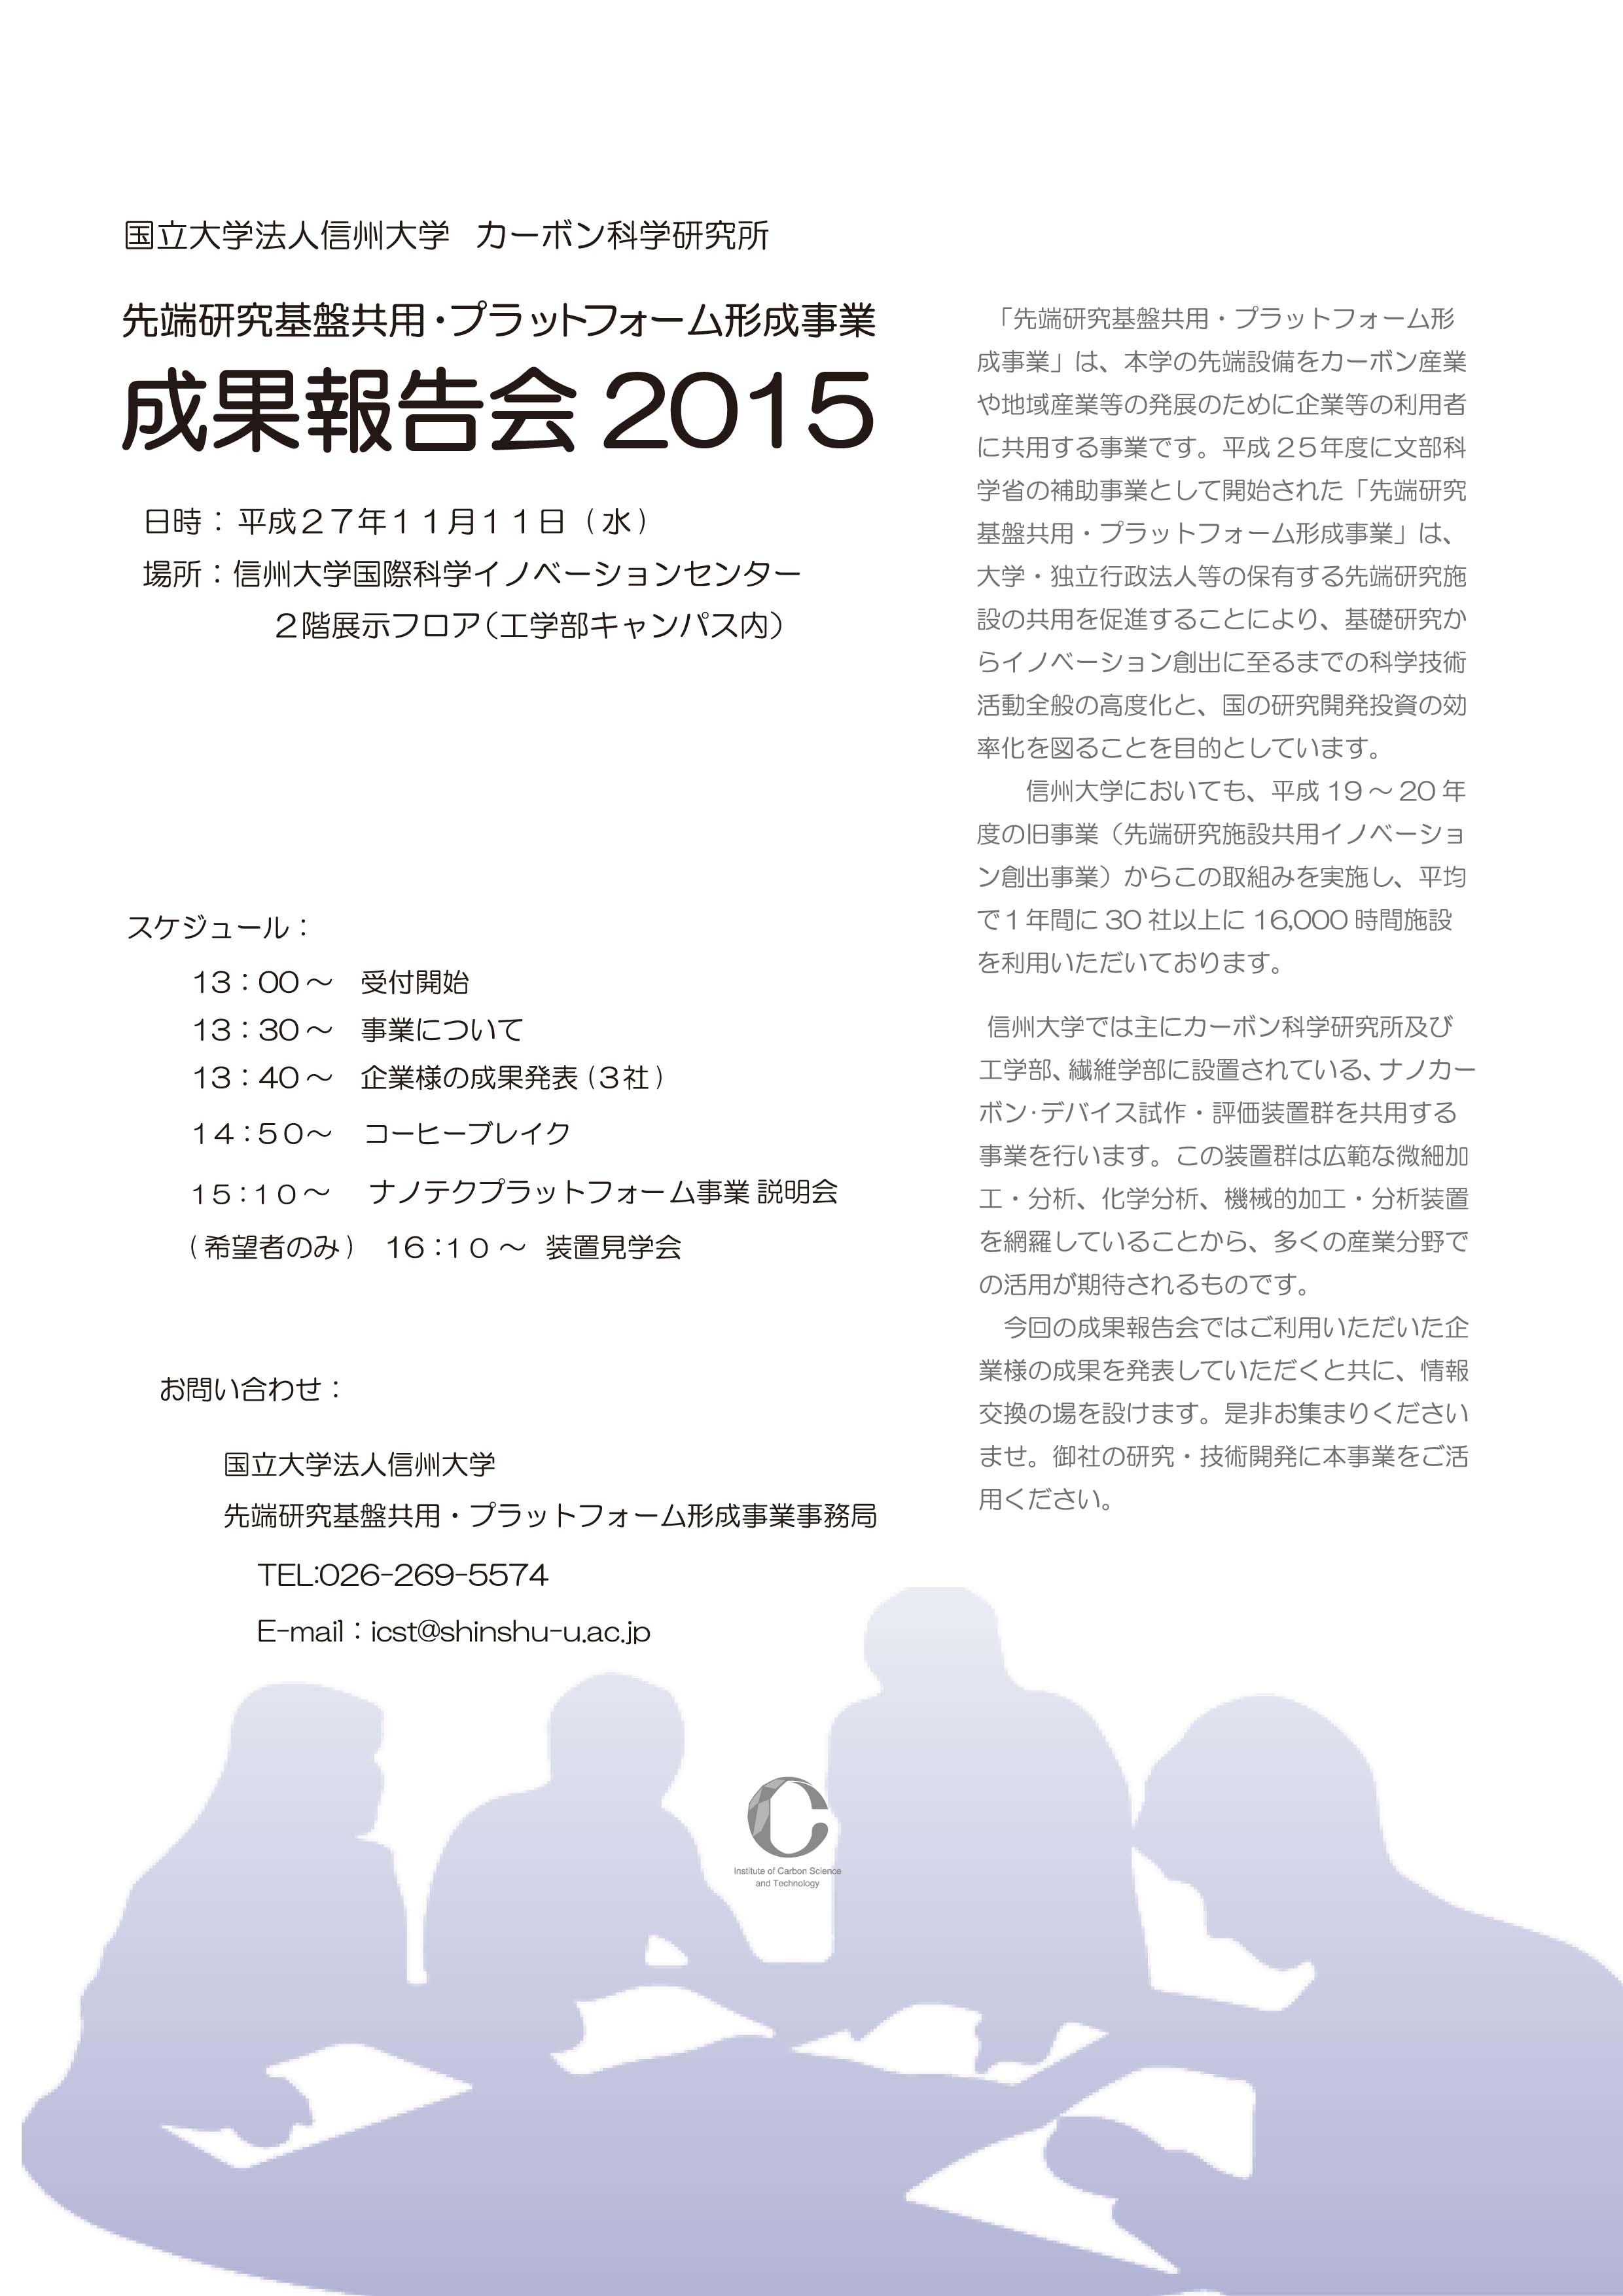 http://www.shinshu-u.ac.jp/institution/icst/kyoyo/information/images/%E6%88%90%E6%9E%9C%E5%A0%B1%E5%91%8A%E4%BC%9A2015.JPEG.jpg